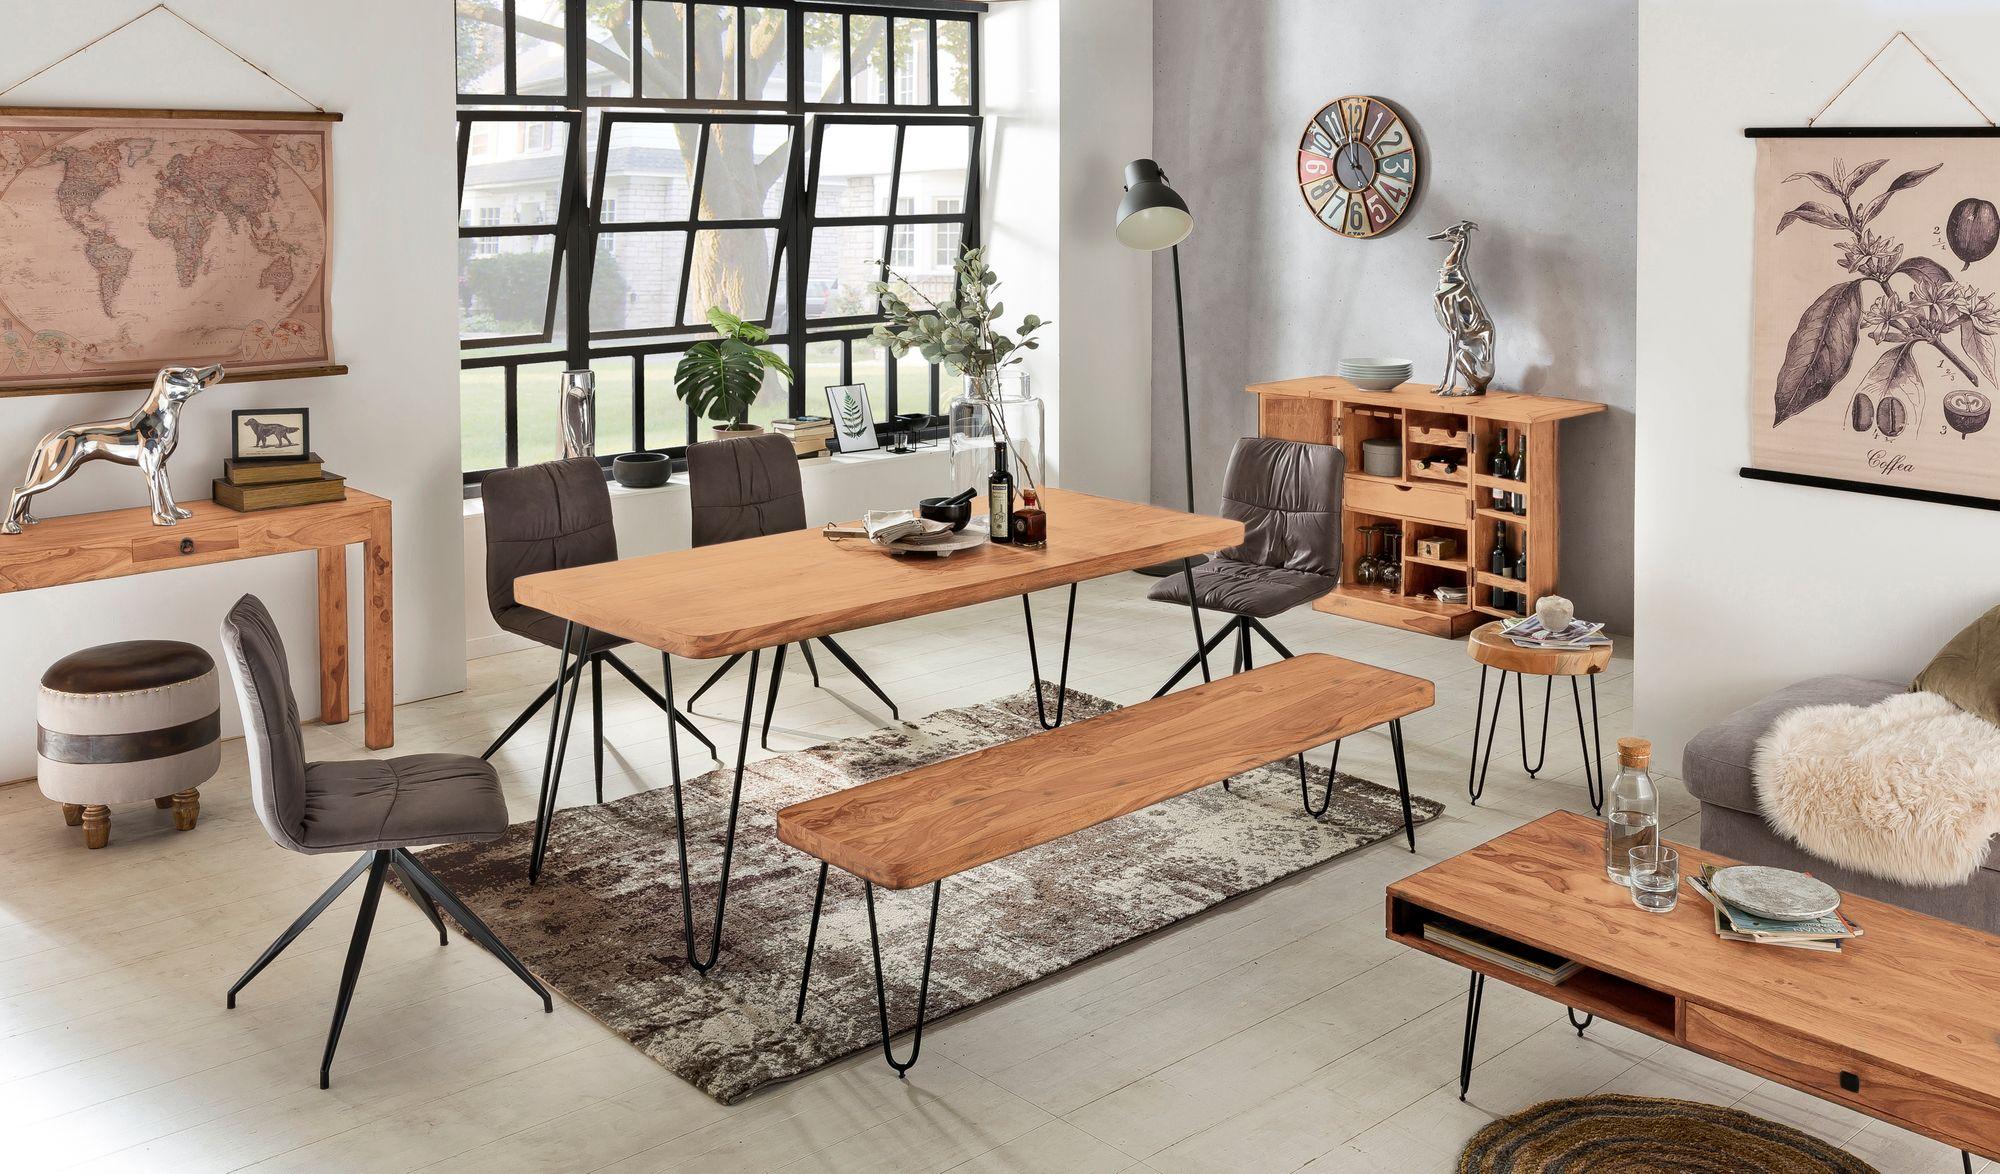 Wohnling Esszimmer Sitzbank Bagli Massiv Holz Akazie 180 X 45 X 40 Cm Holz Bank Natur